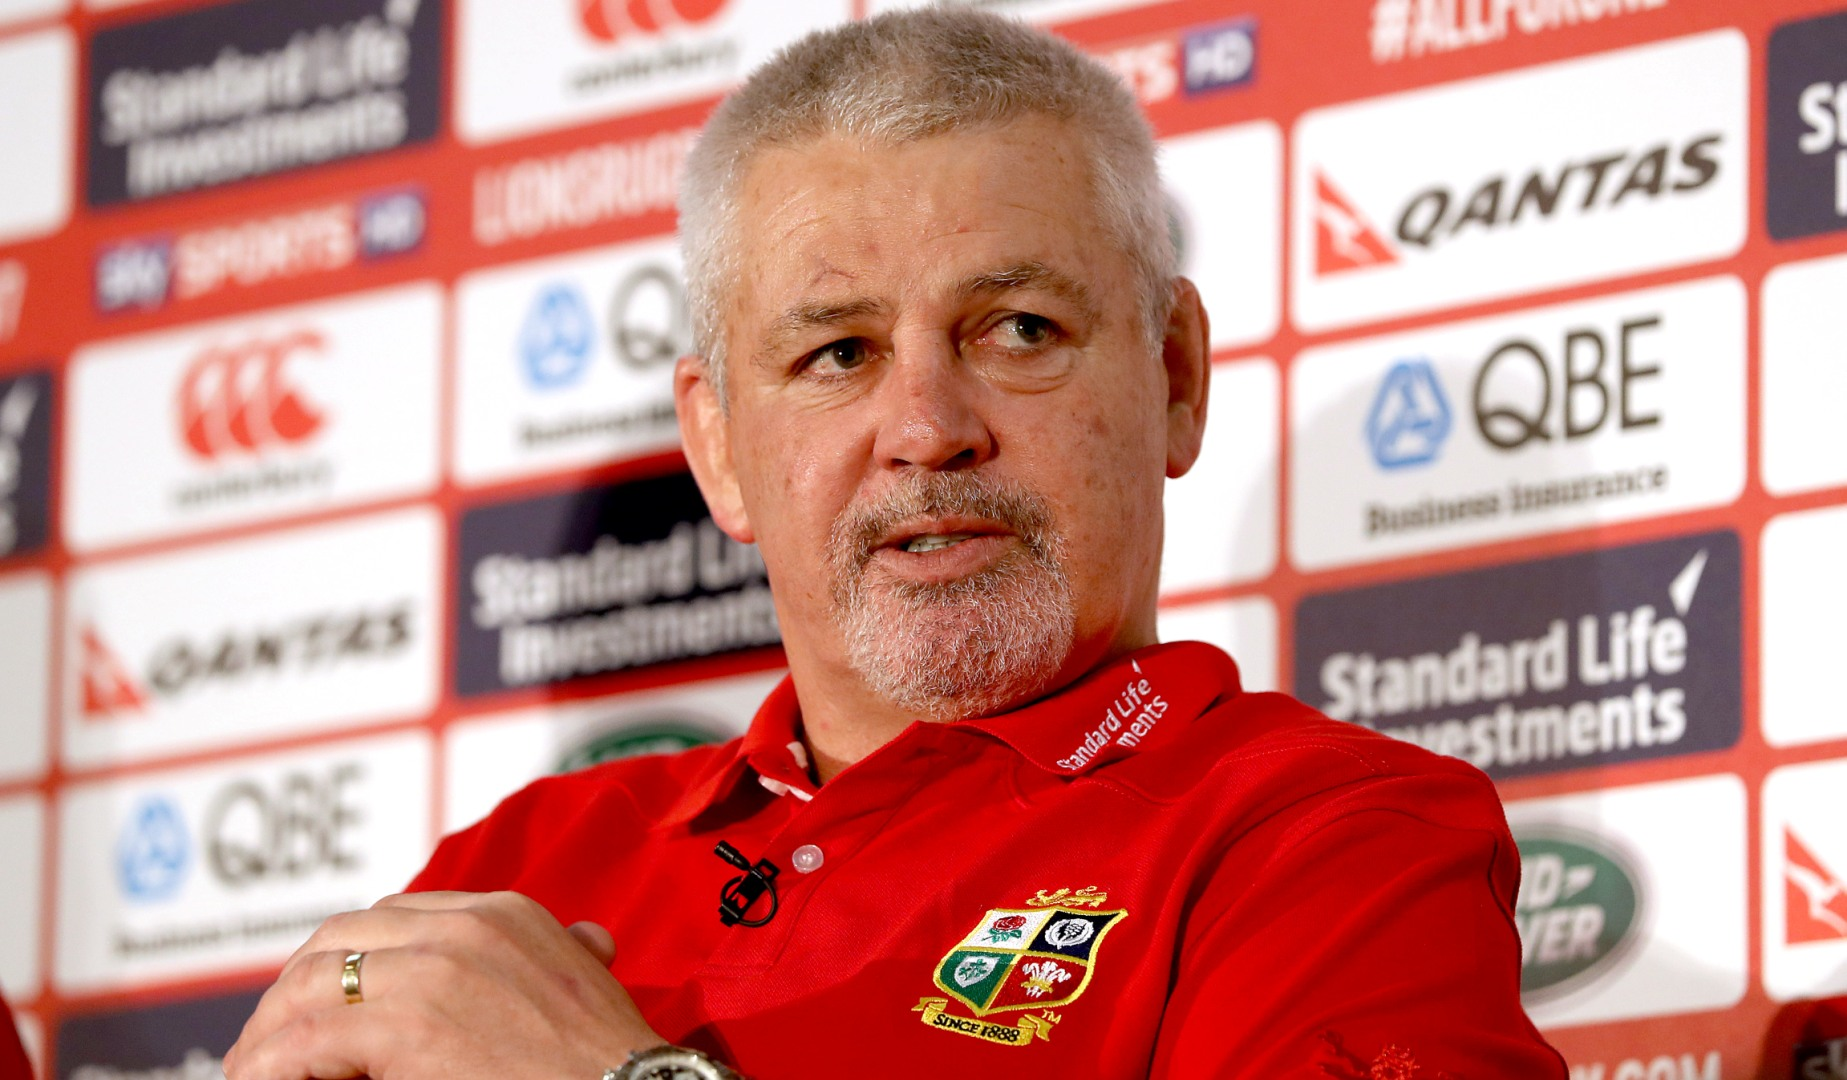 Excitement rises ahead of Lions squad announcement